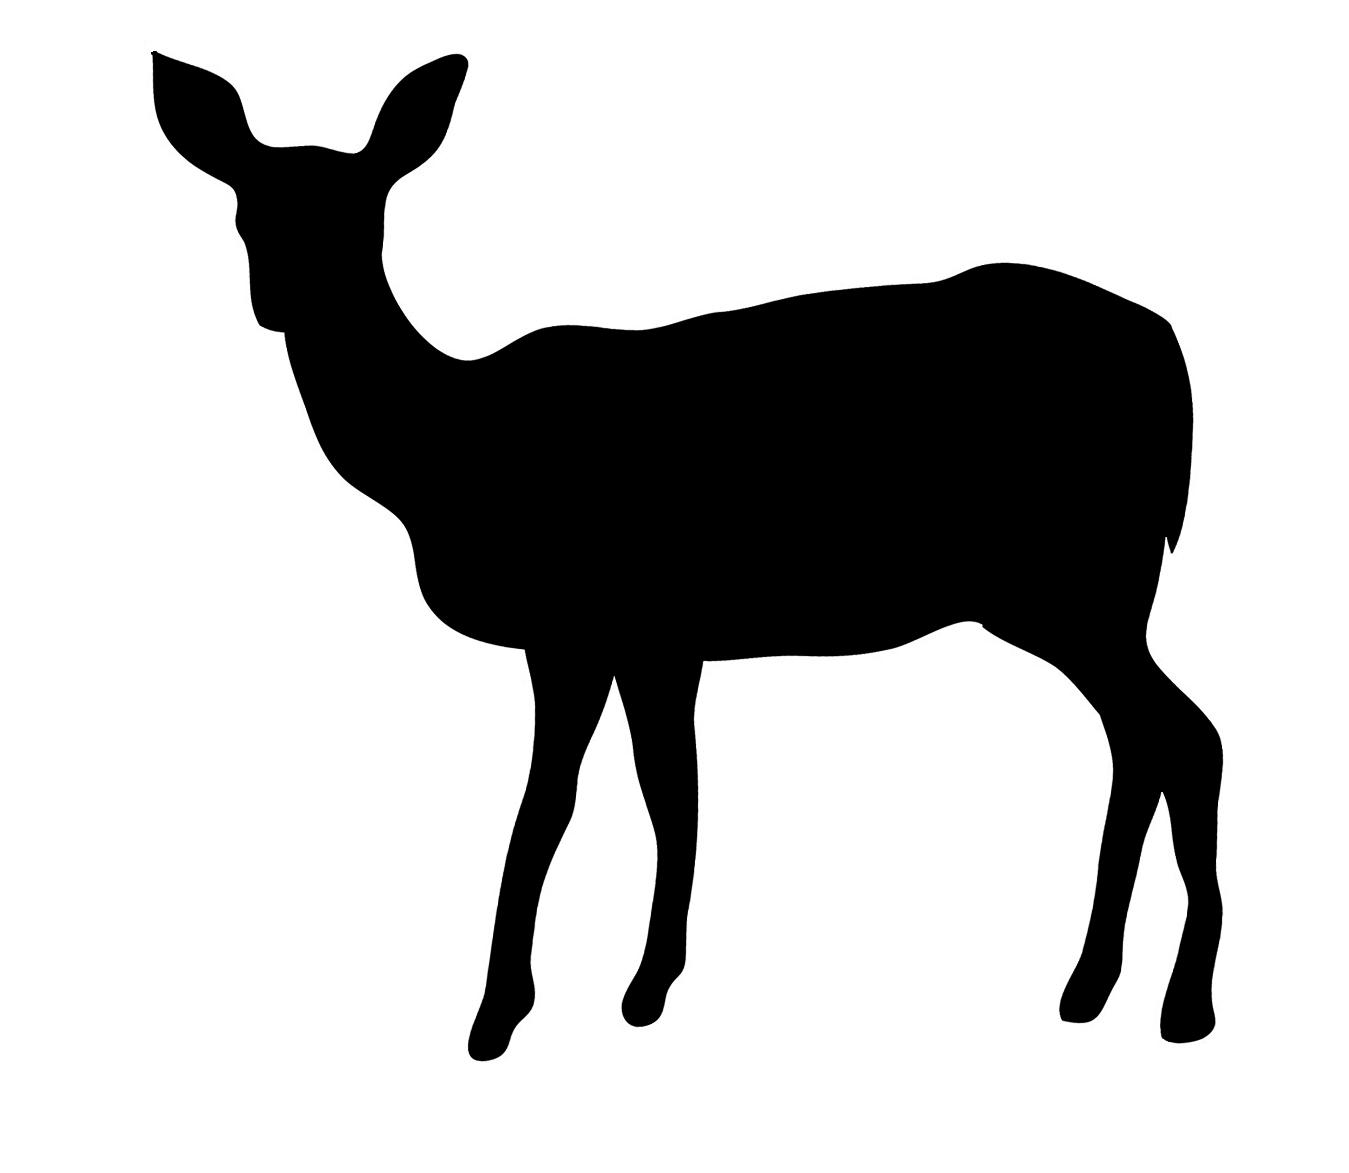 1349x1173 Deer Silhouette Clip Art